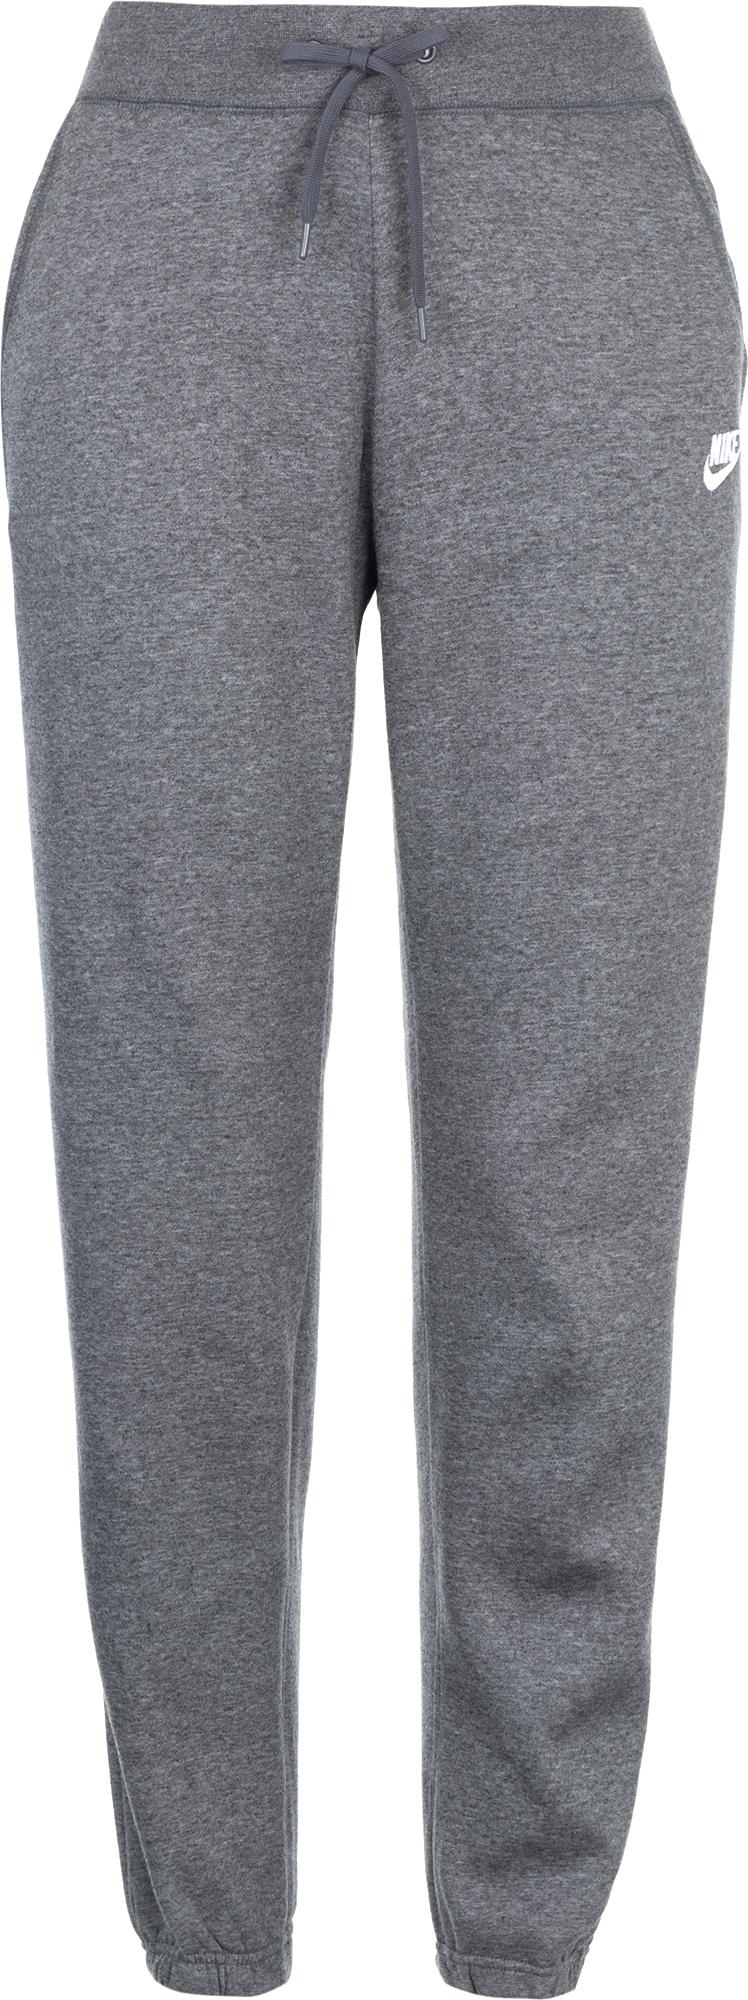 Nike Брюки женские Nike Sportswear, размер 50-52 nike бриджи женские nike sportswear vintage размер 48 50